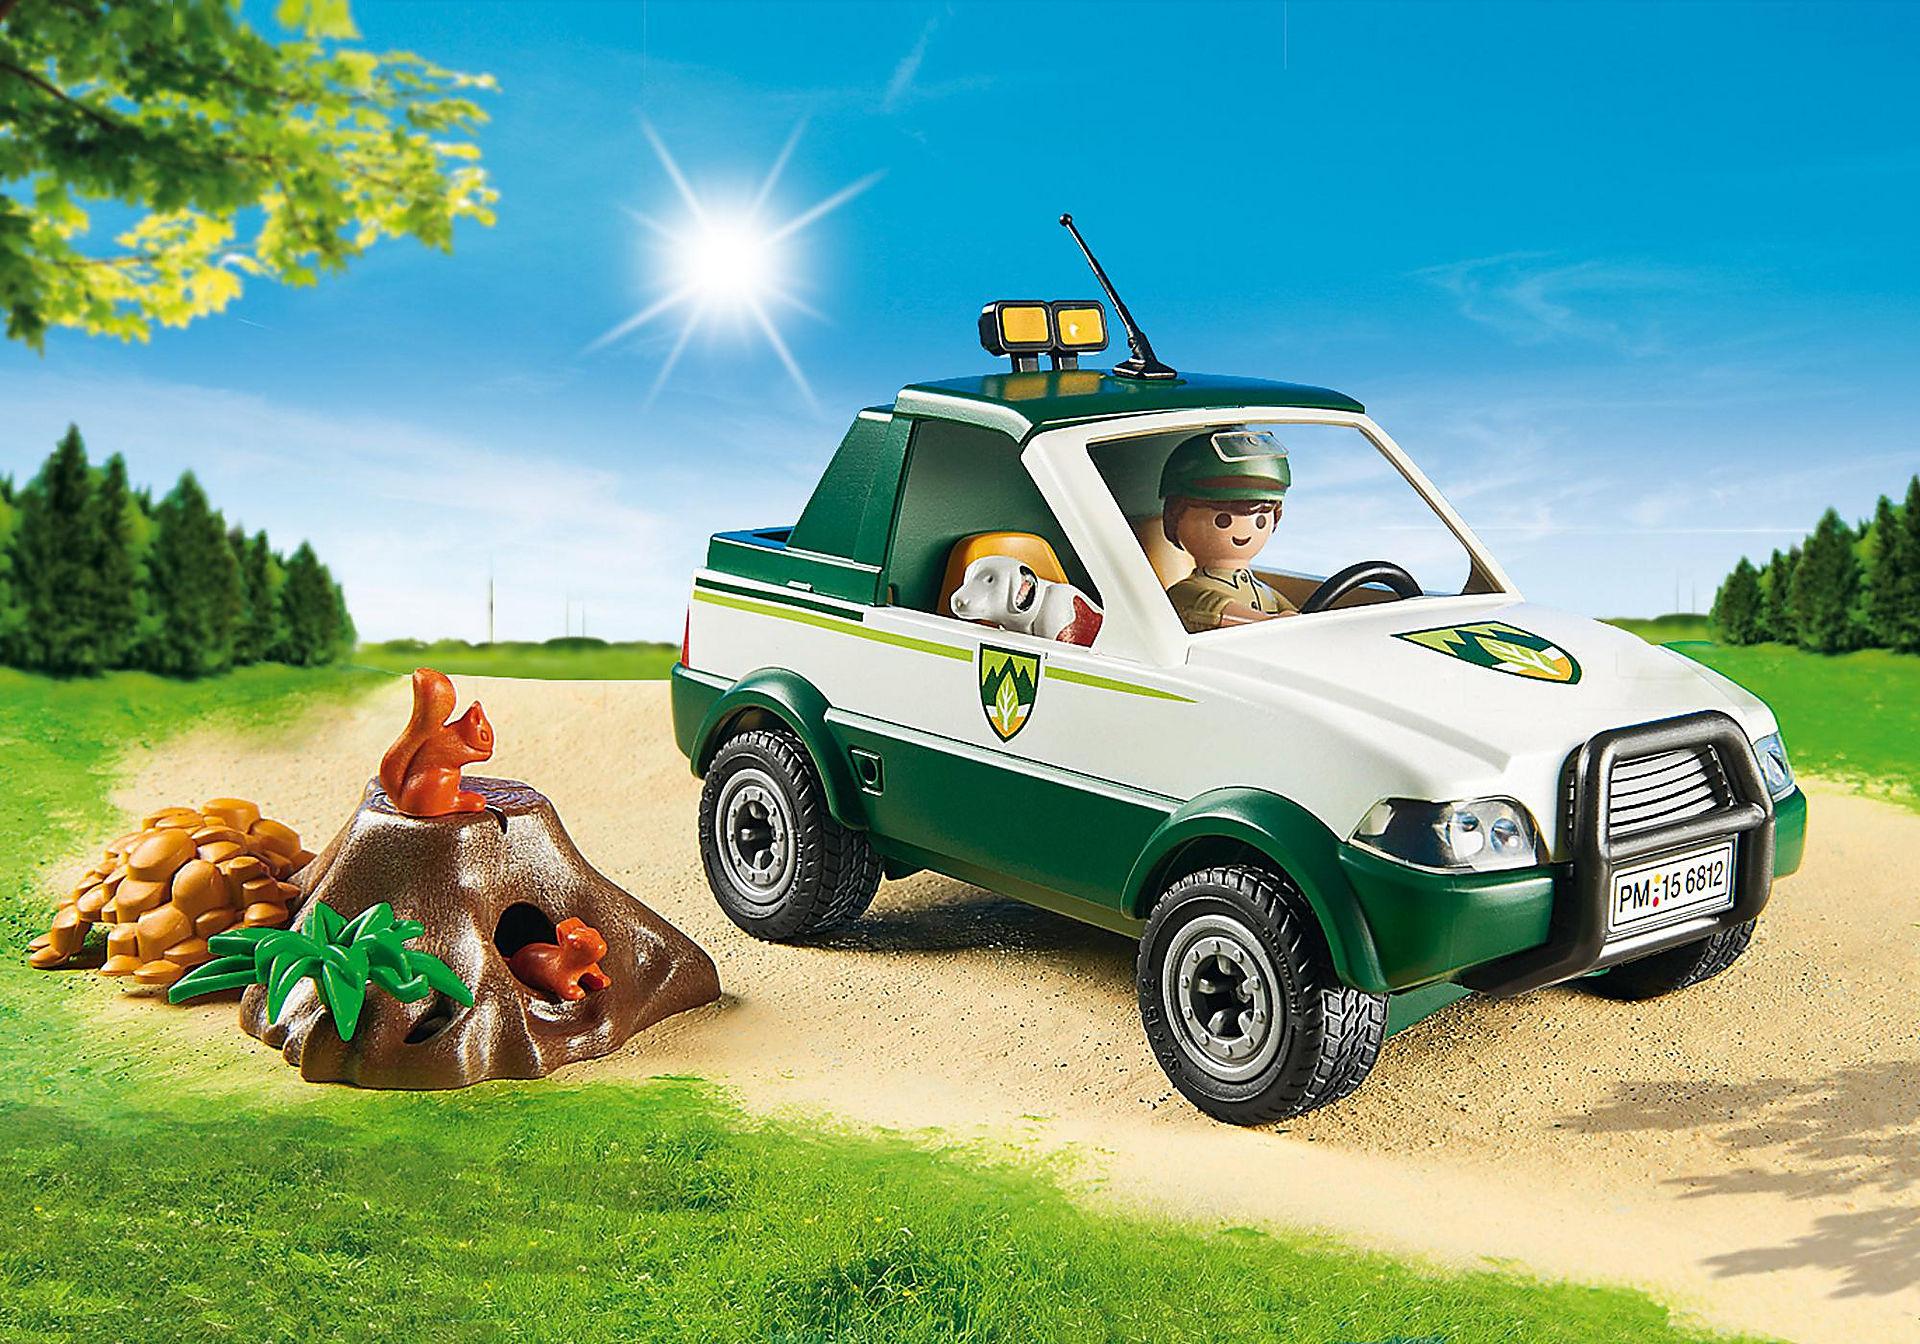 6812 Garde forestier avec pick-up zoom image6